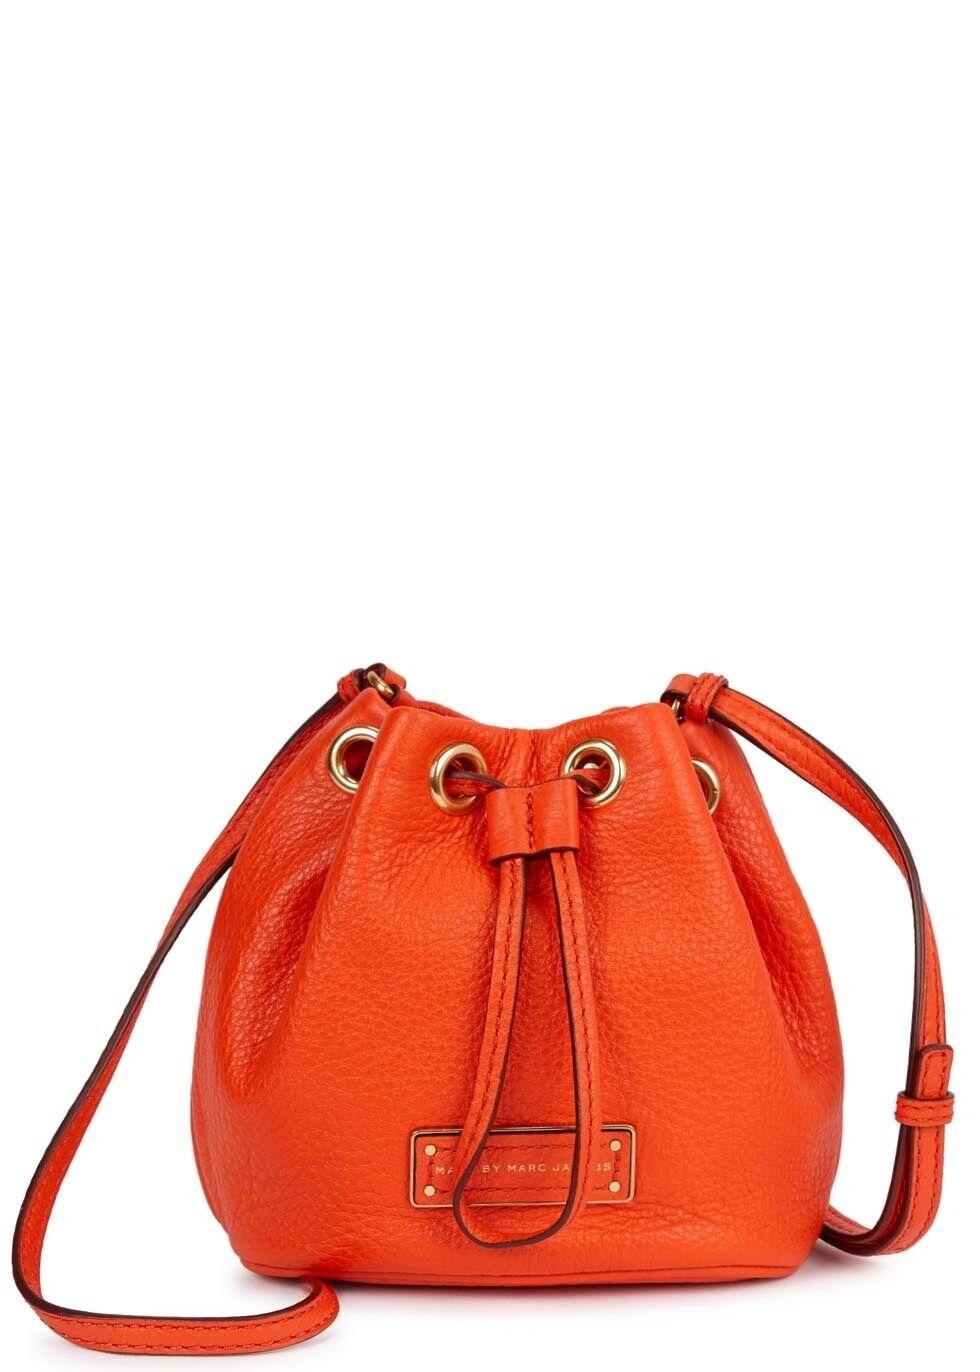 Marc by Marc Jacobs Too Hot To Handle Mini Mini Mini Drawstring Bag Tasche Orange NEU   | Vorzugspreis  | Optimaler Preis  | Verpackungsvielfalt  b6e237